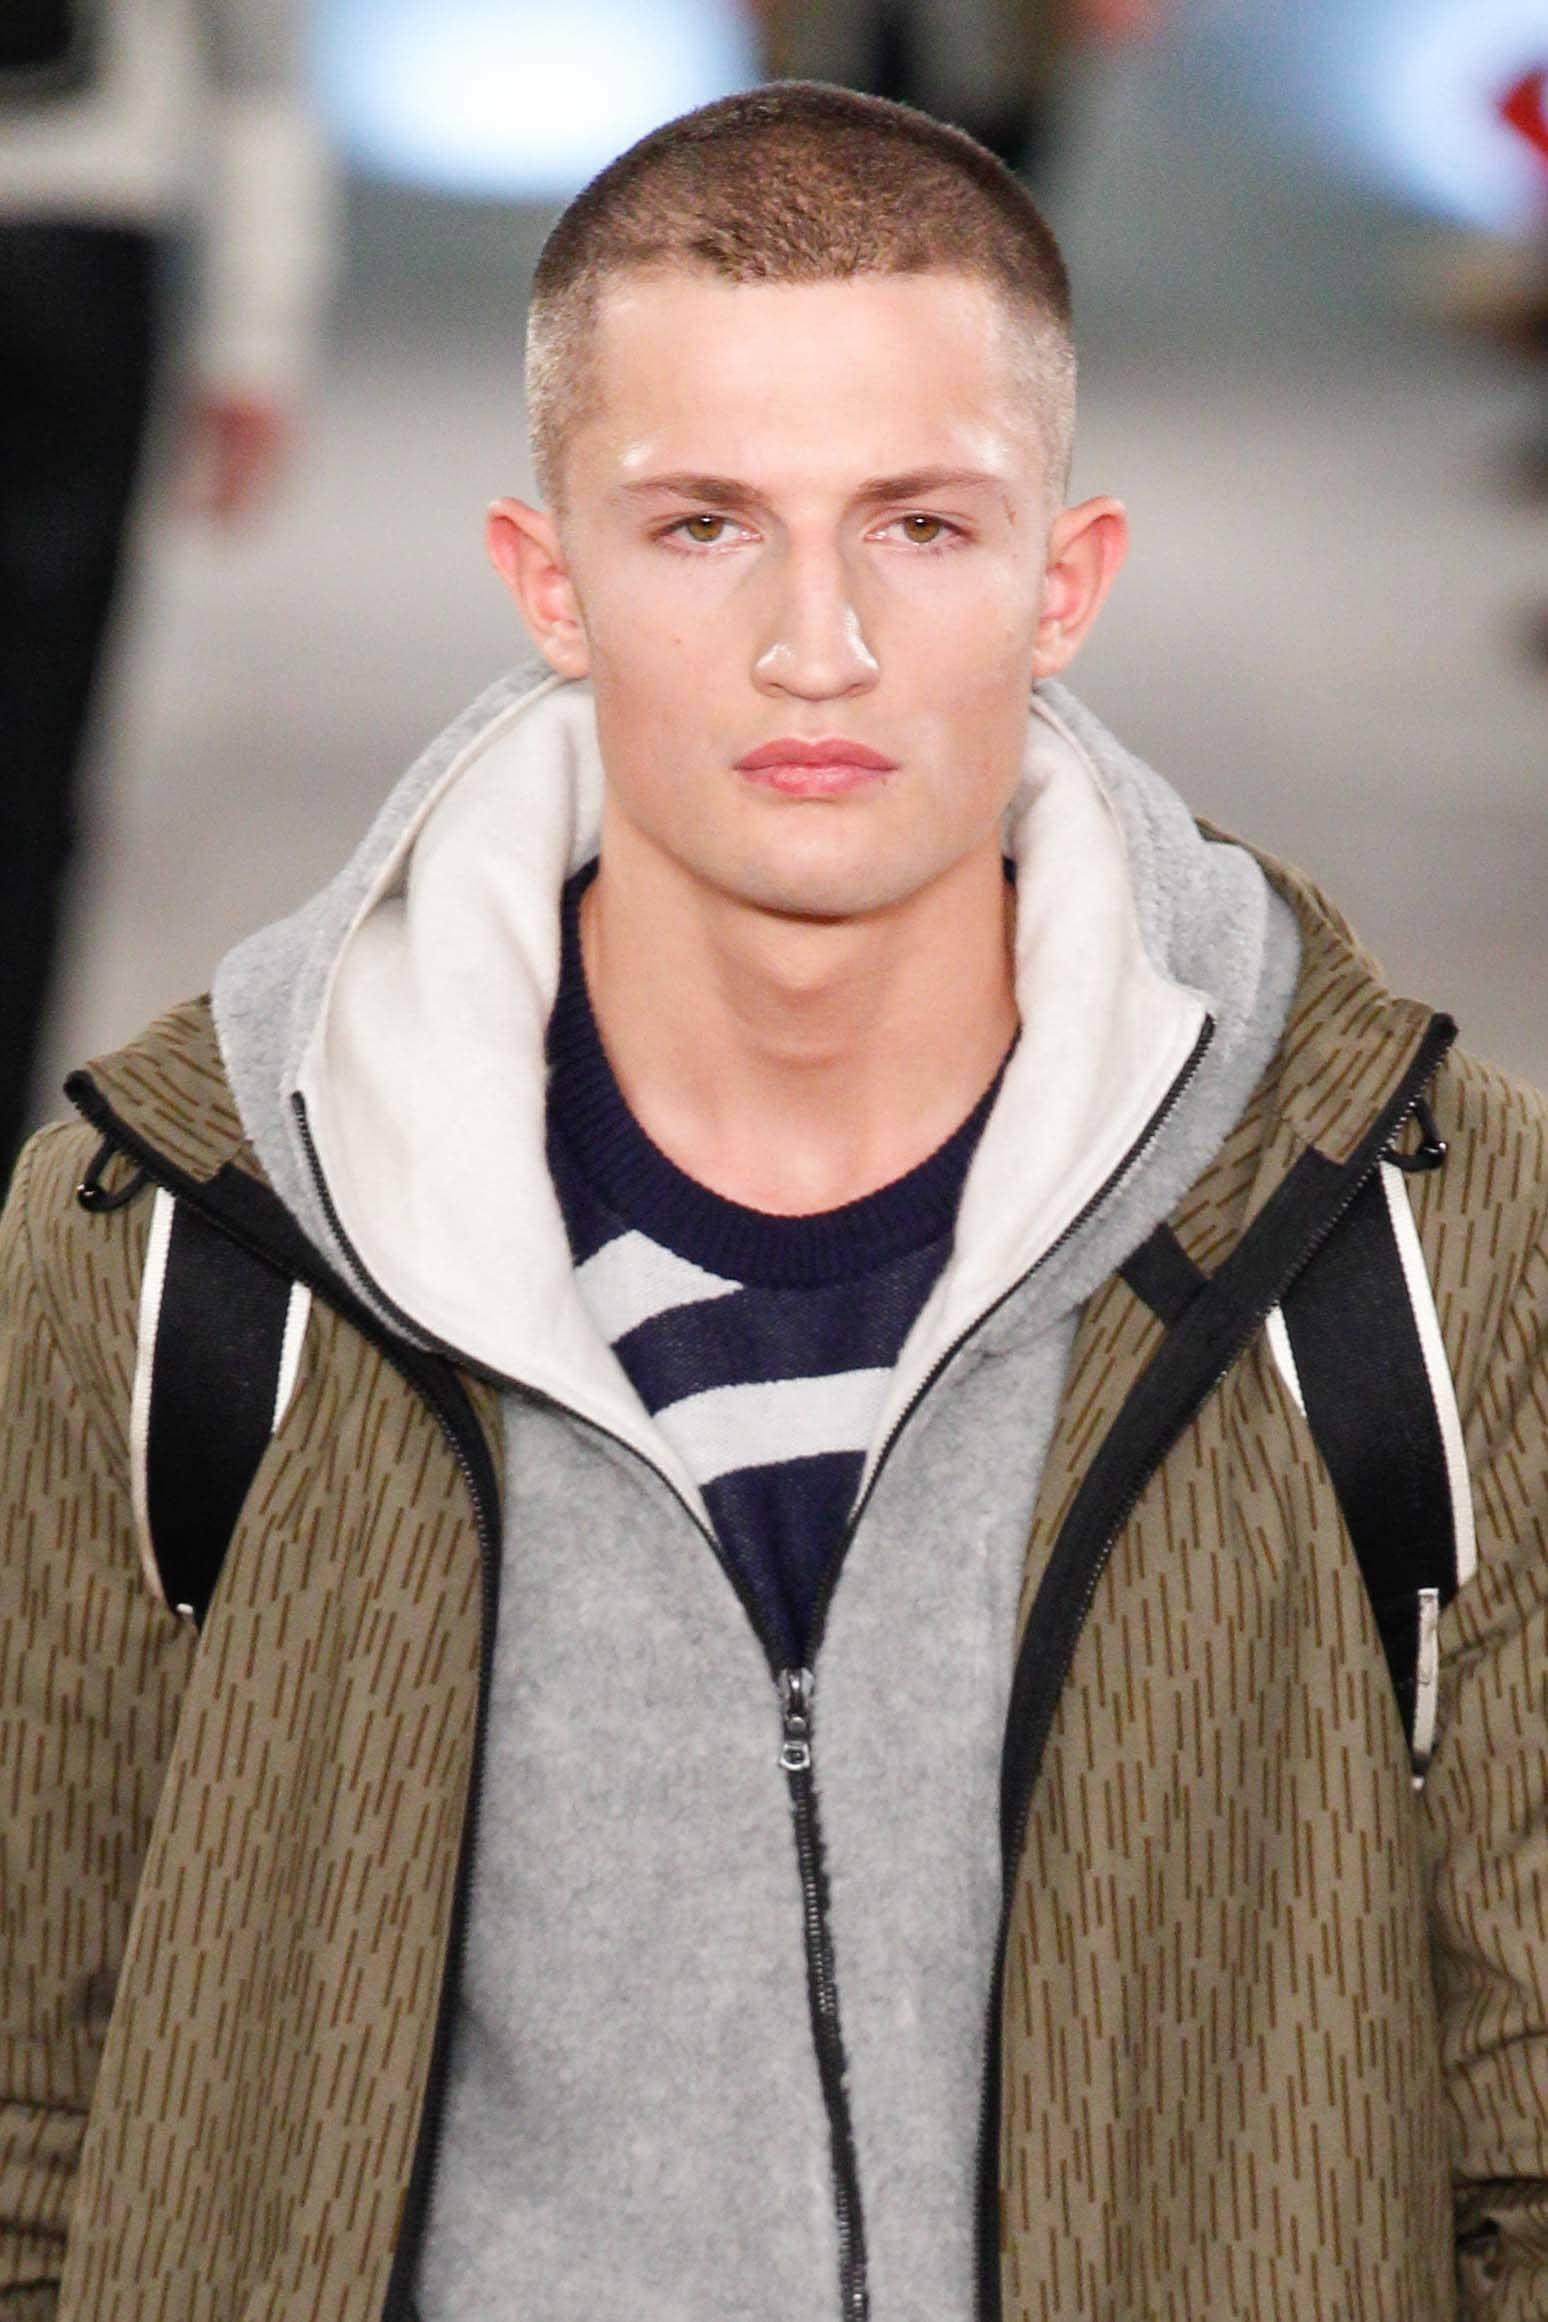 New buzz cut men's hair ideas to try buzz with undercut